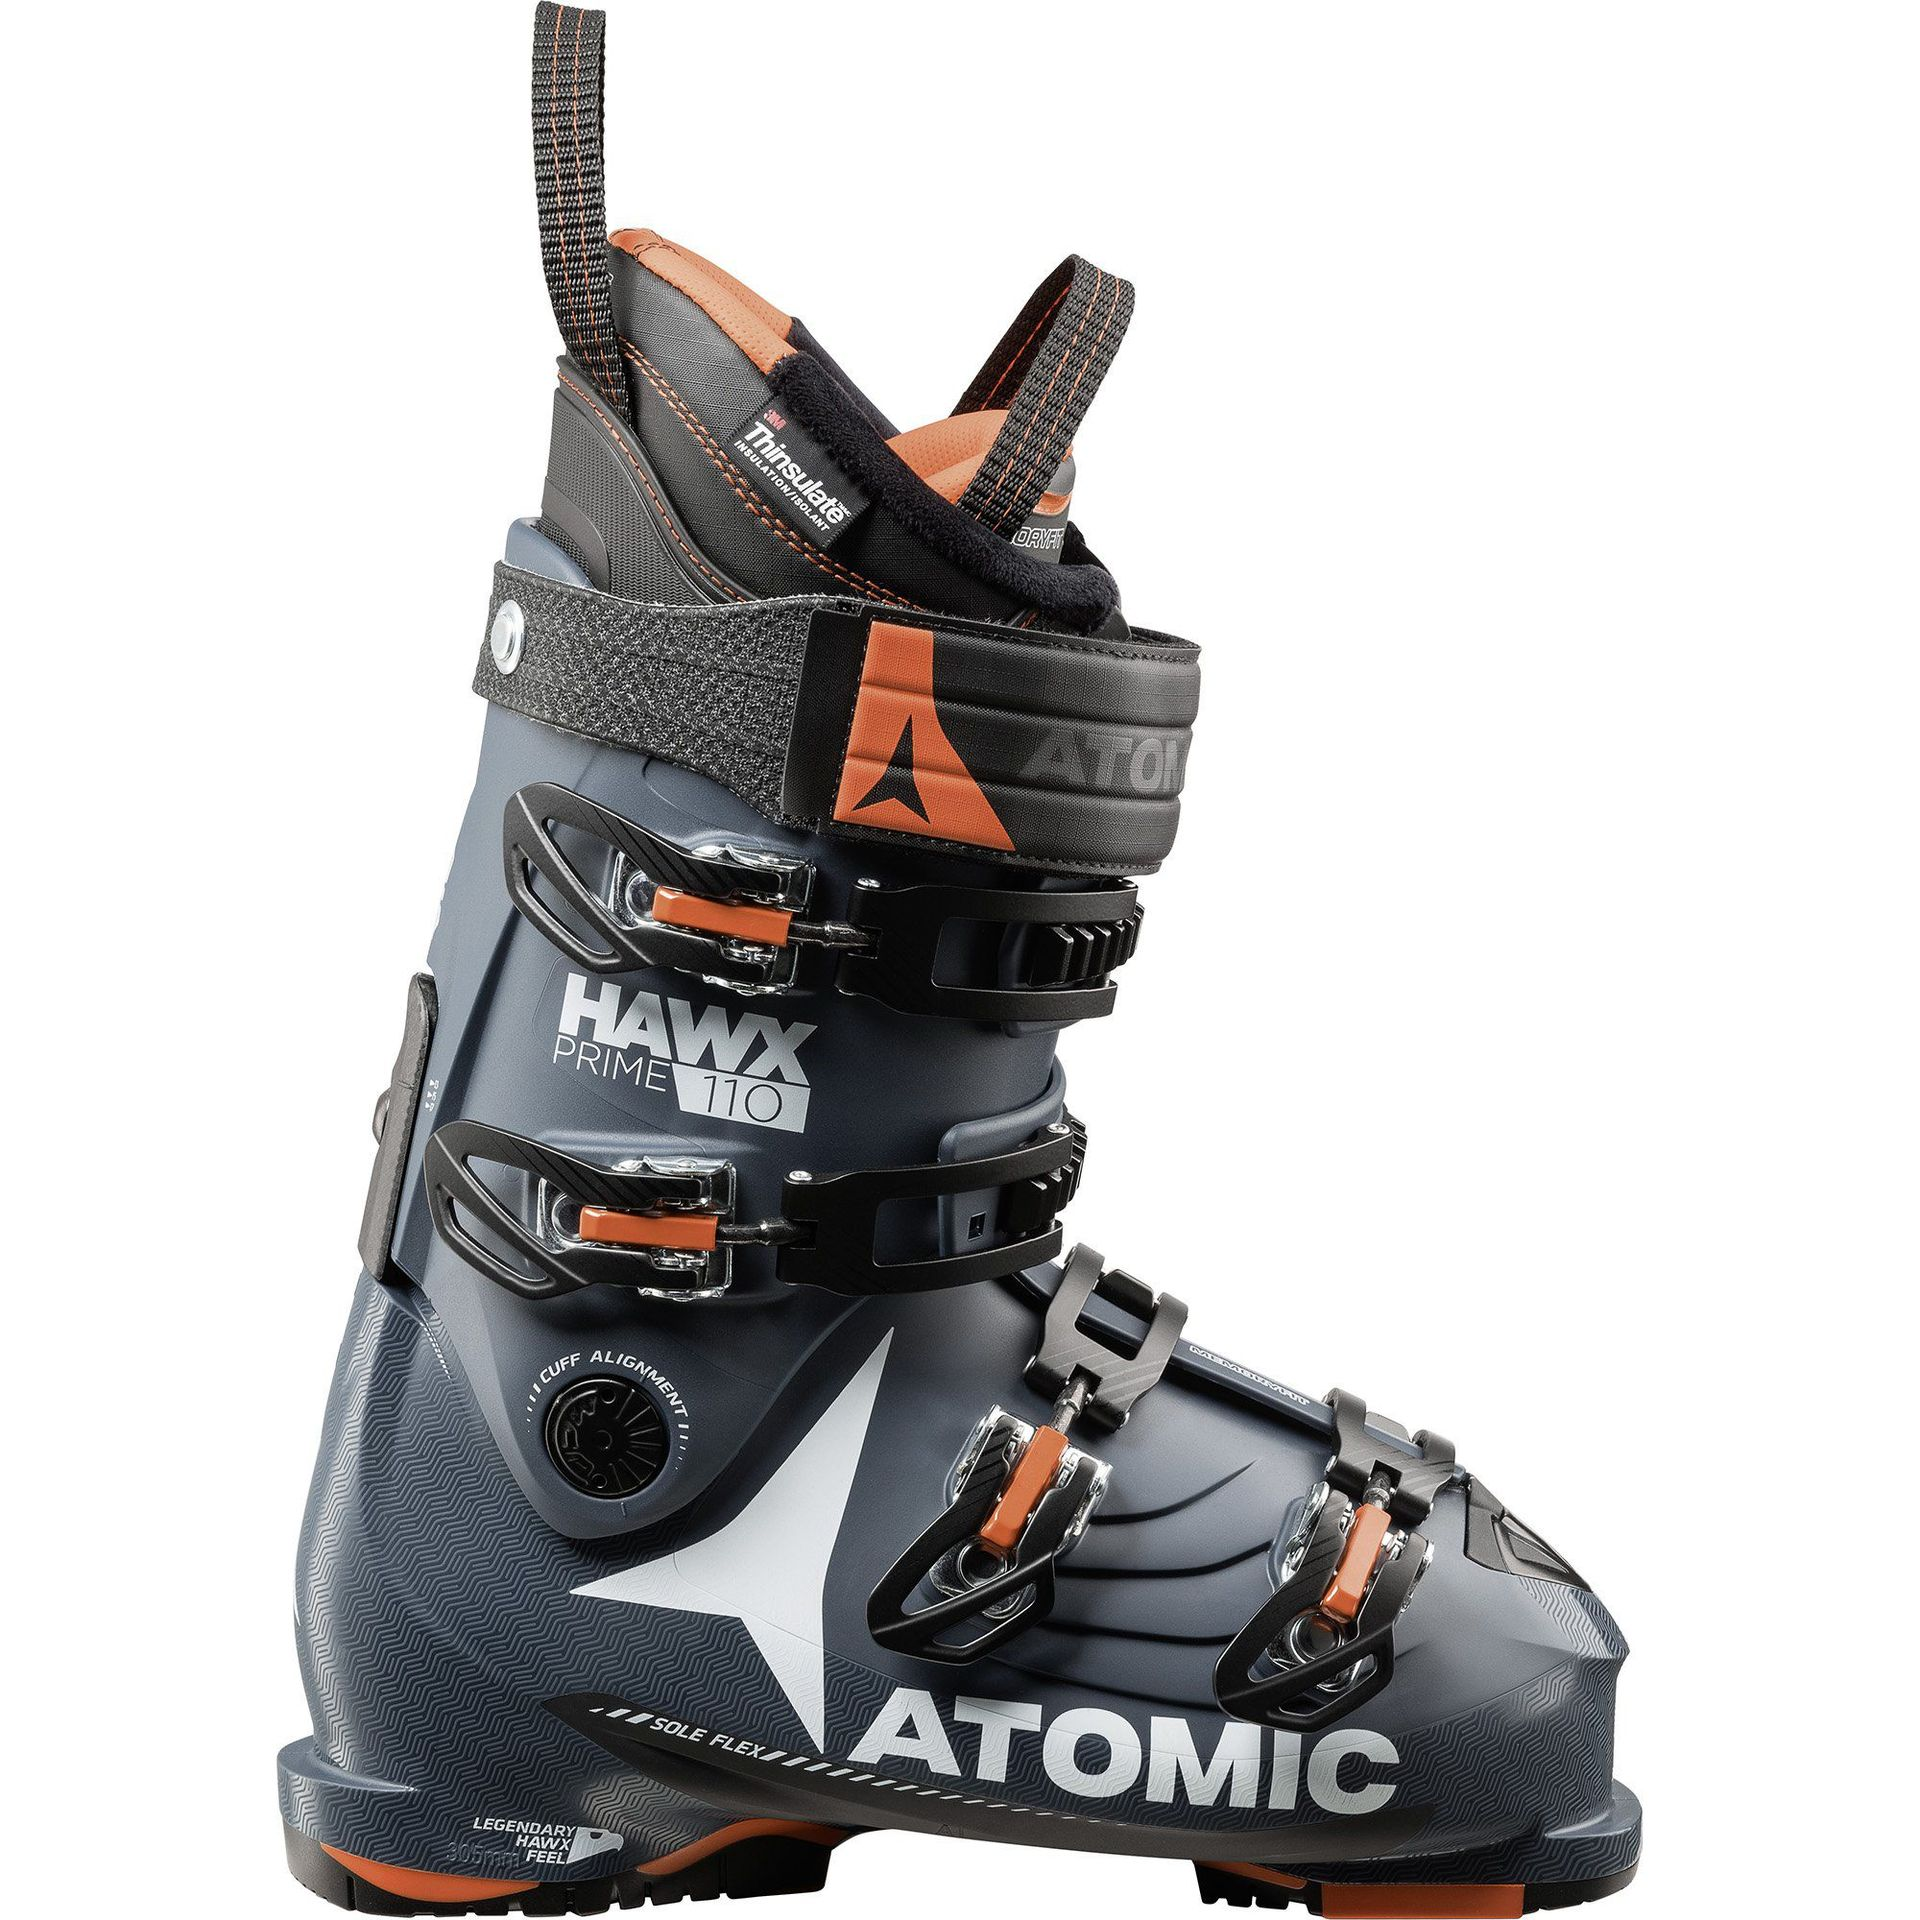 BUTY NARCIARSKIE ATOMIC HAWX PRIME 110 AE5016420